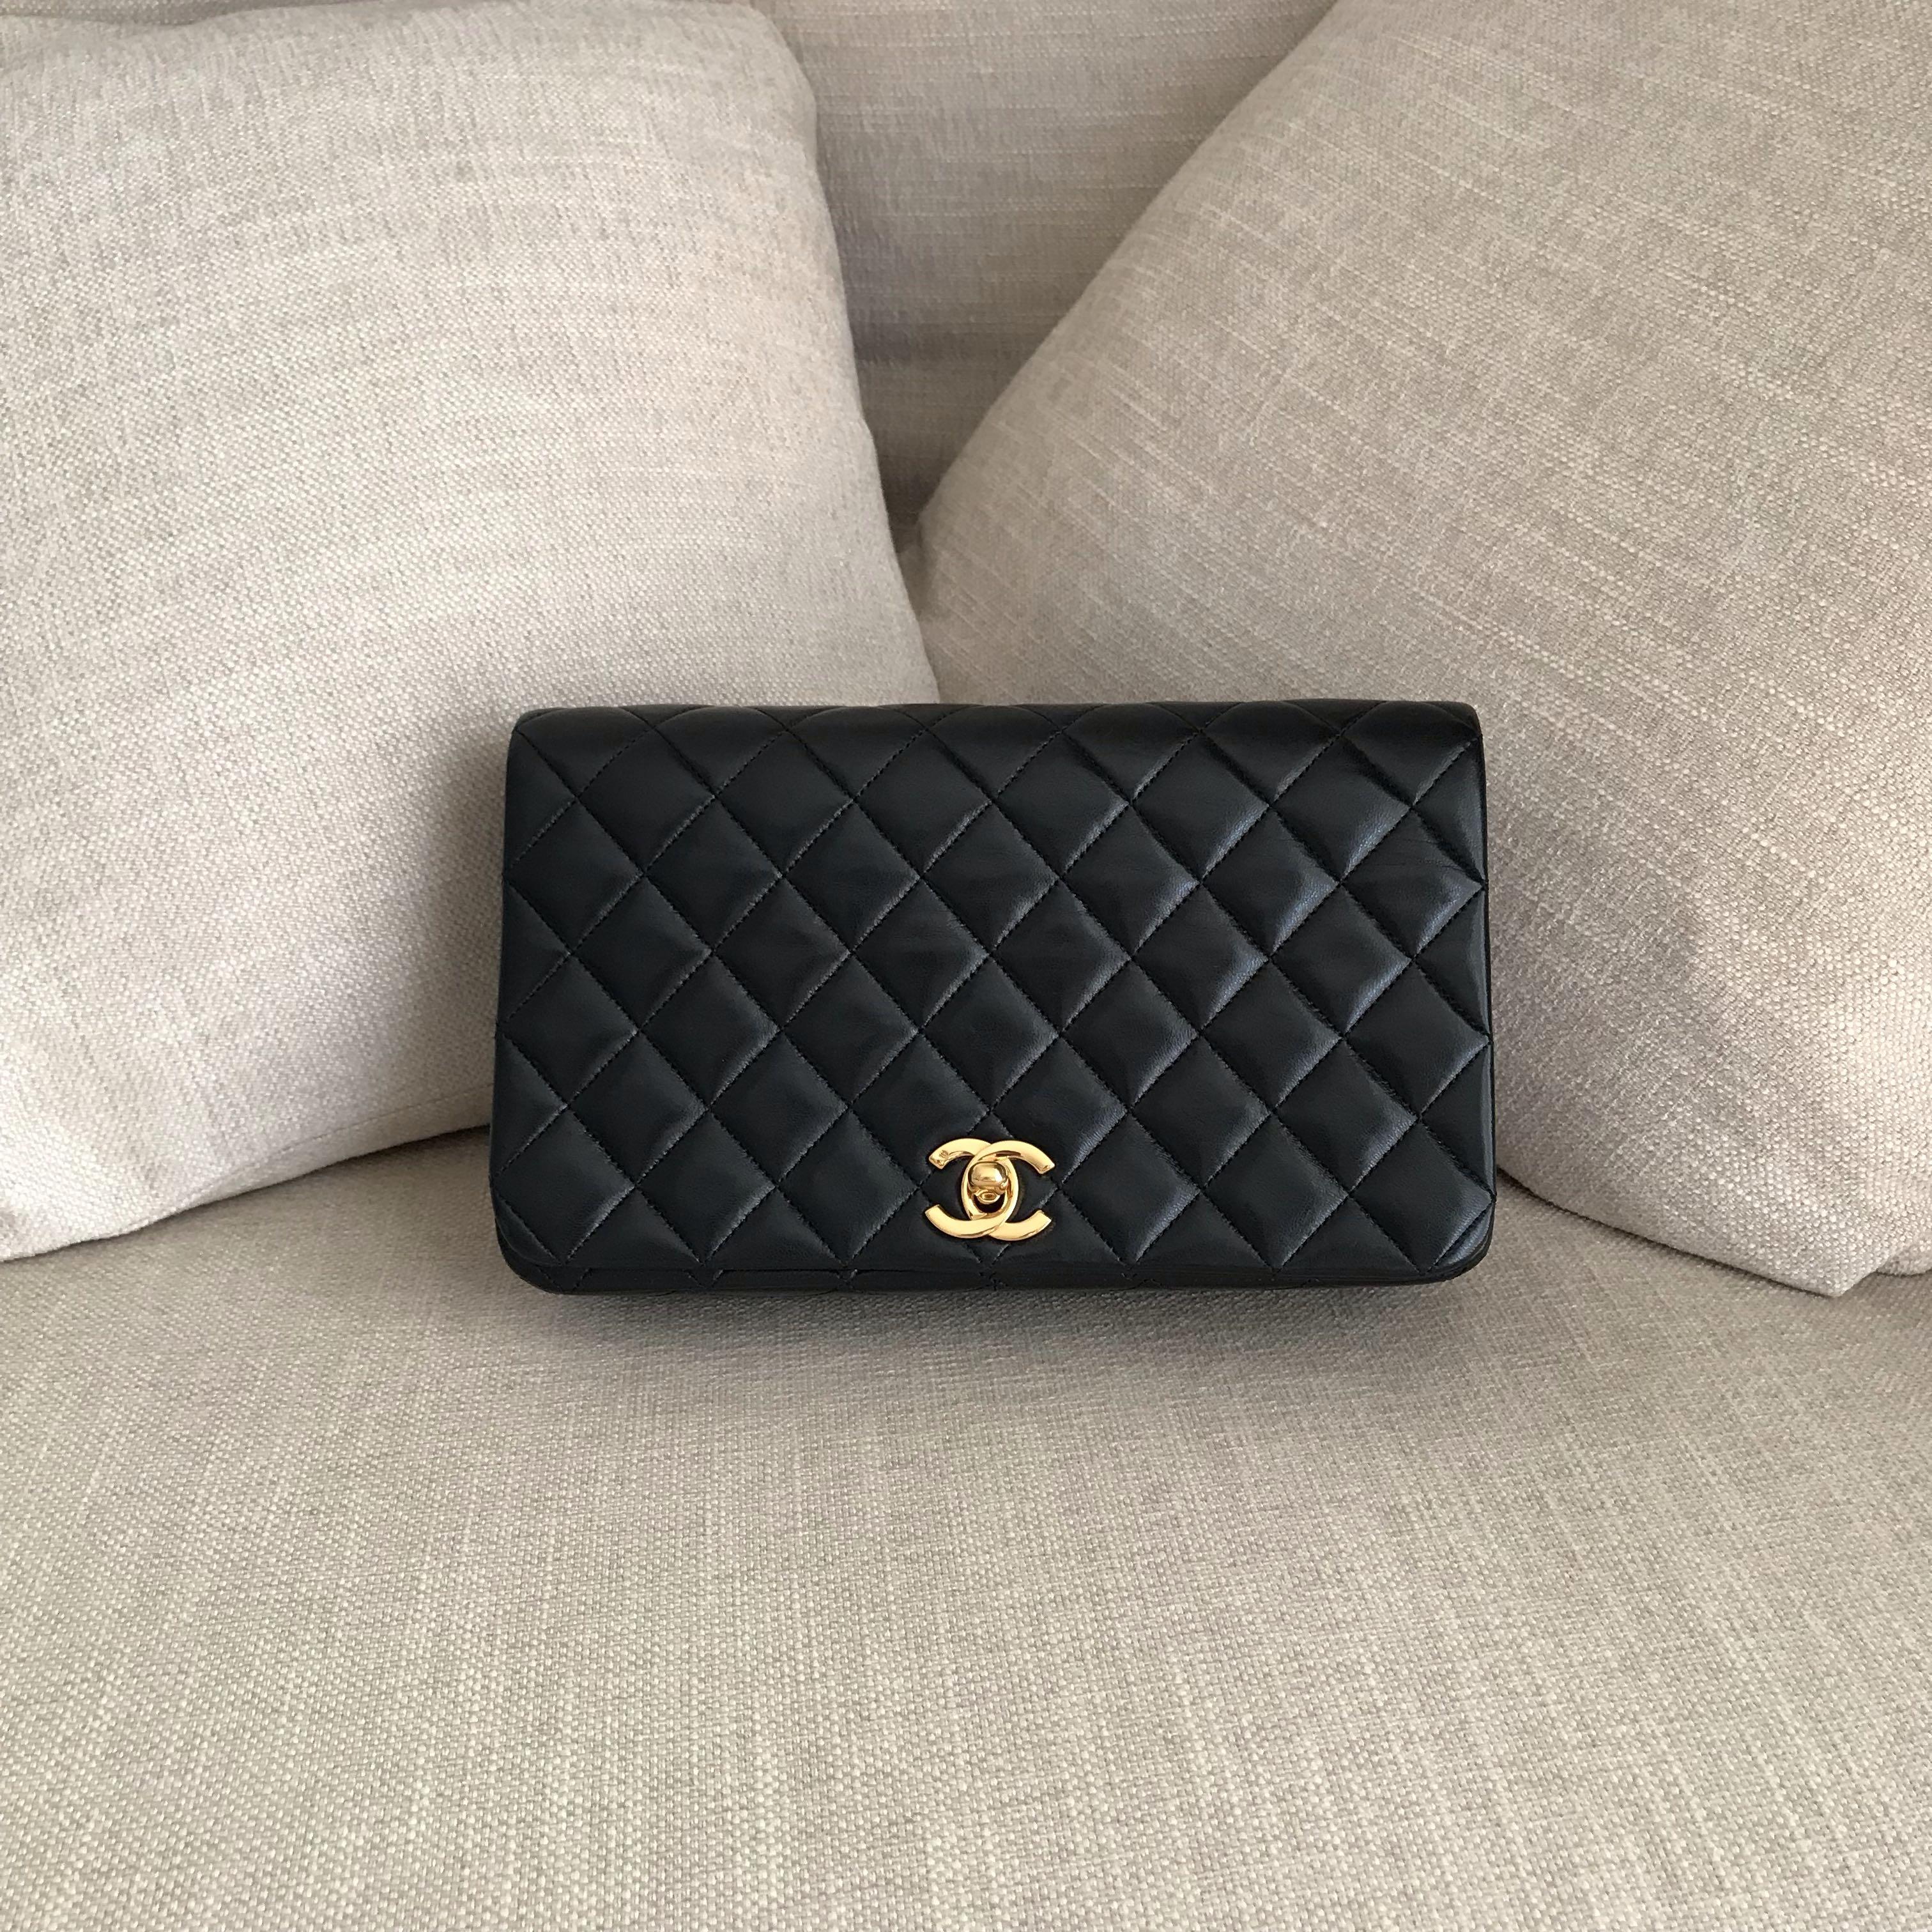 70ddb4c1ac70 CHANEL Lambskin Full Flap Chain Shoulder Bag, Women's Fashion, Bags ...